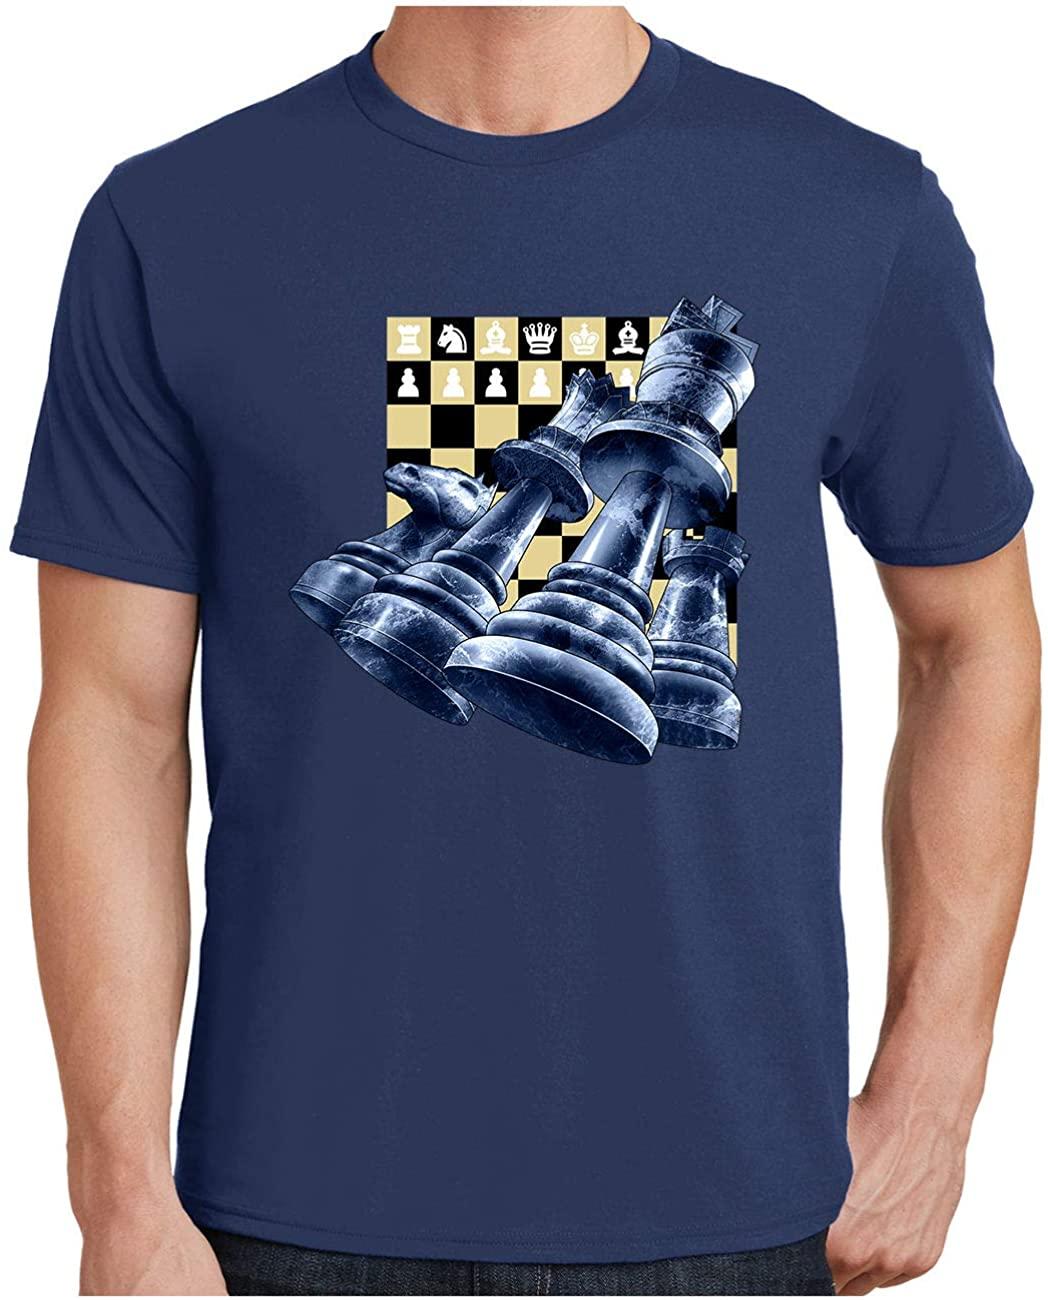 HARD EDGE DESIGN Men's Chess Pieces Plus Size Crew Neck T-Shirt, 5X-Large, Navy